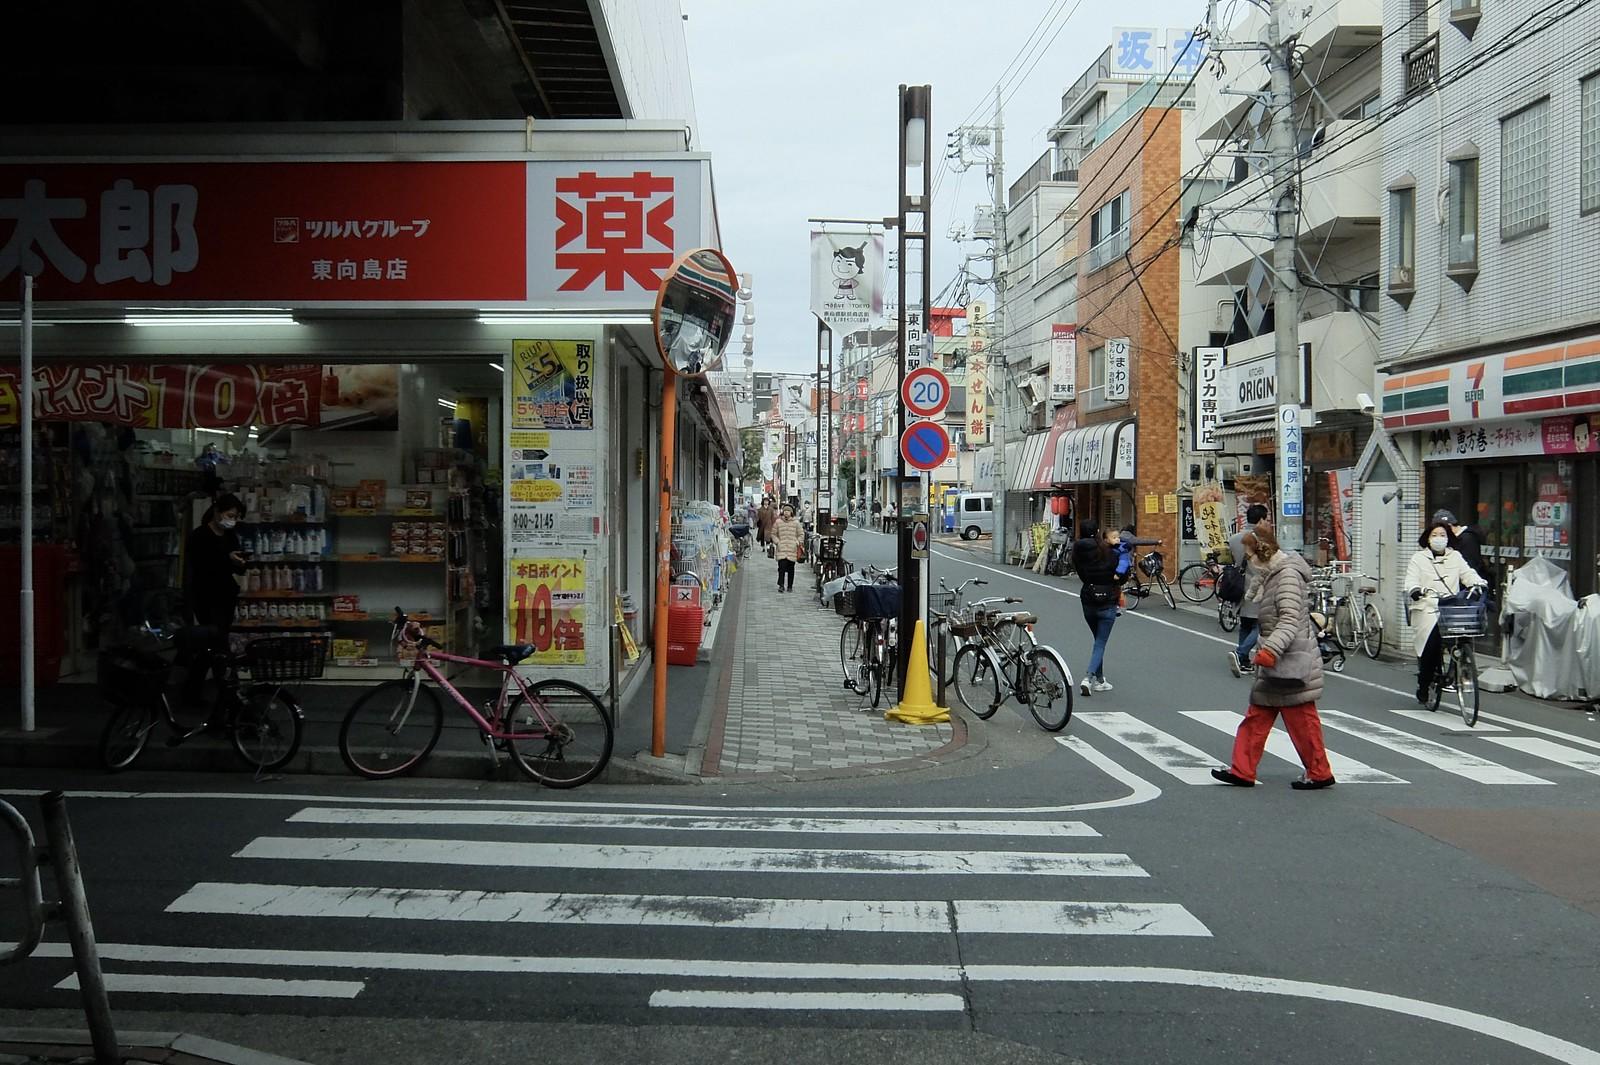 Tokyo - 2020